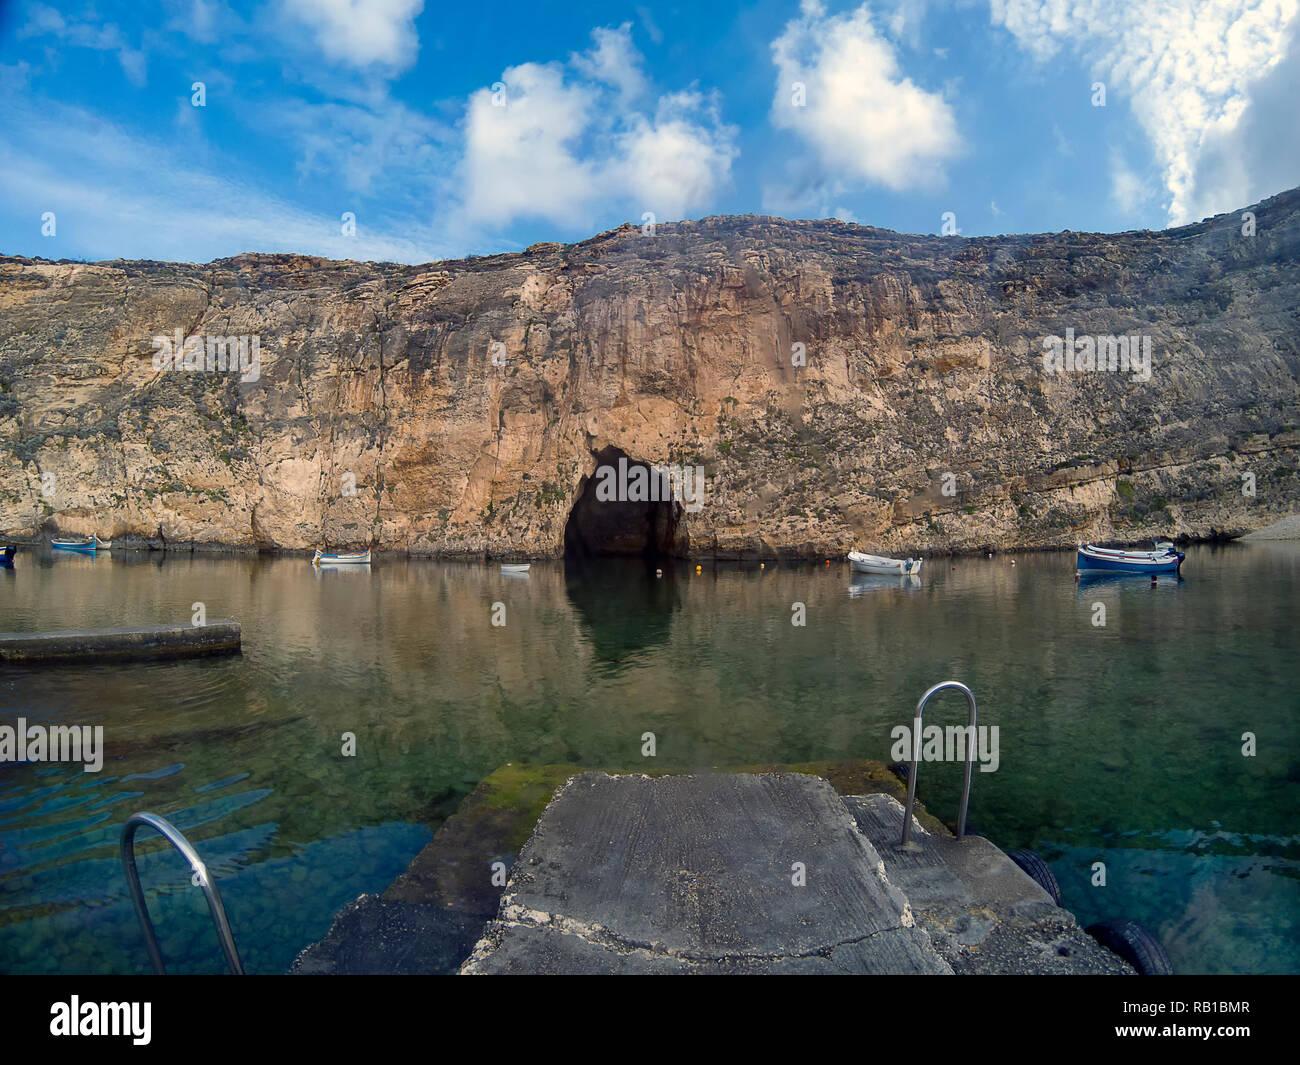 Inland Sea on the island of Gozo, Malta - Stock Image